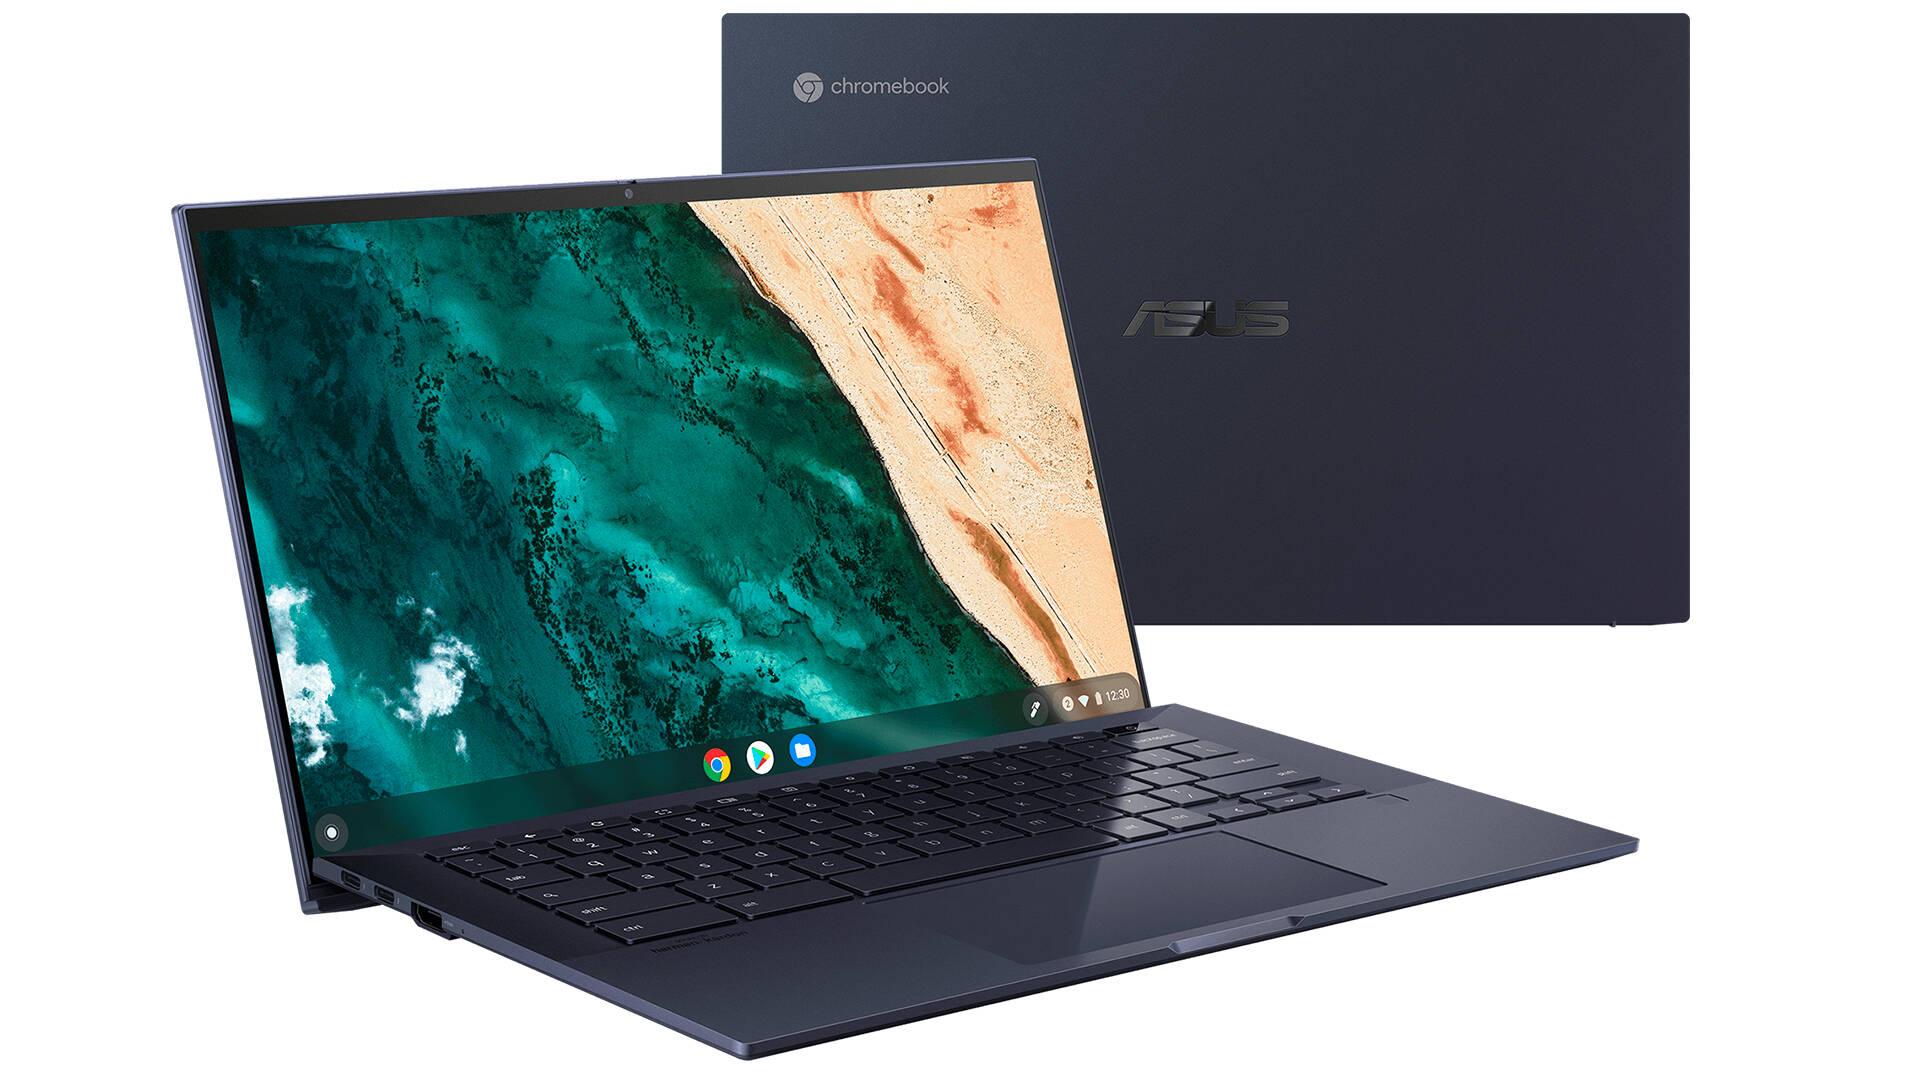 Asus Chromebook CX9